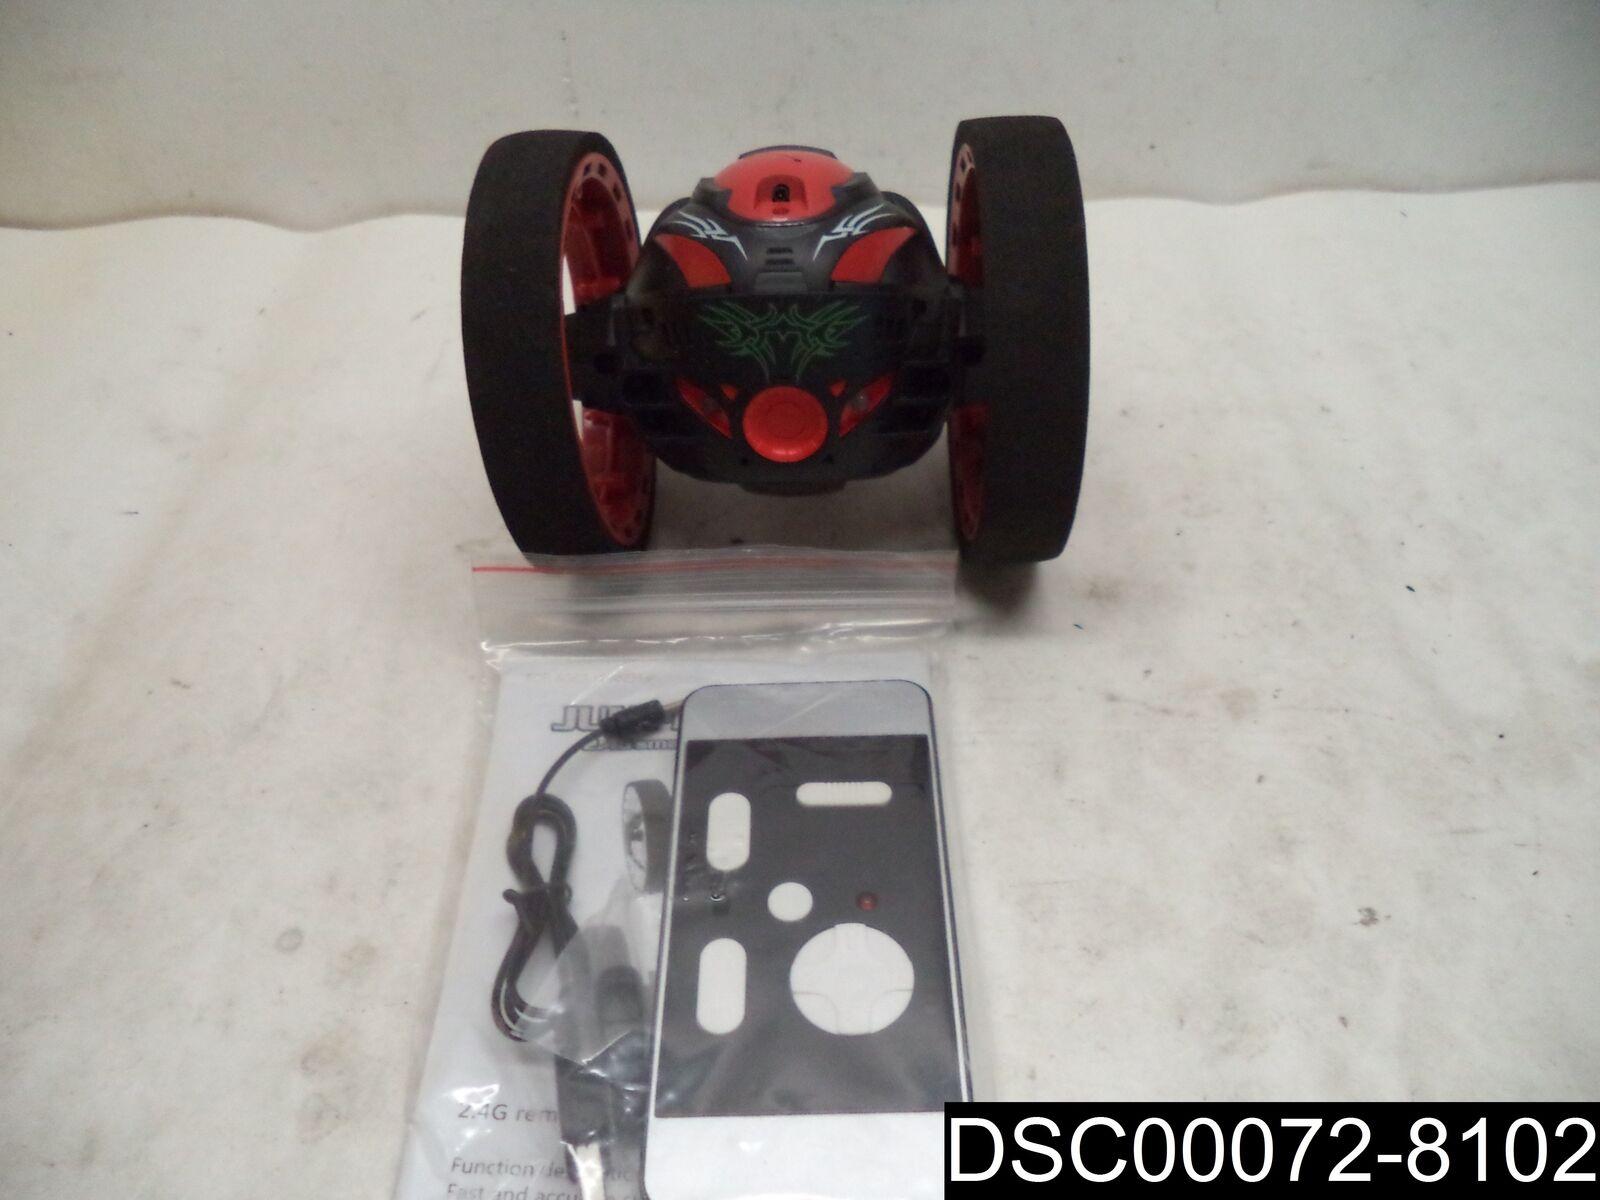 Kidshome PEG - 88 2.4GHz Remote Control Bounce Car w/80W Camera 360 Degree, rosso